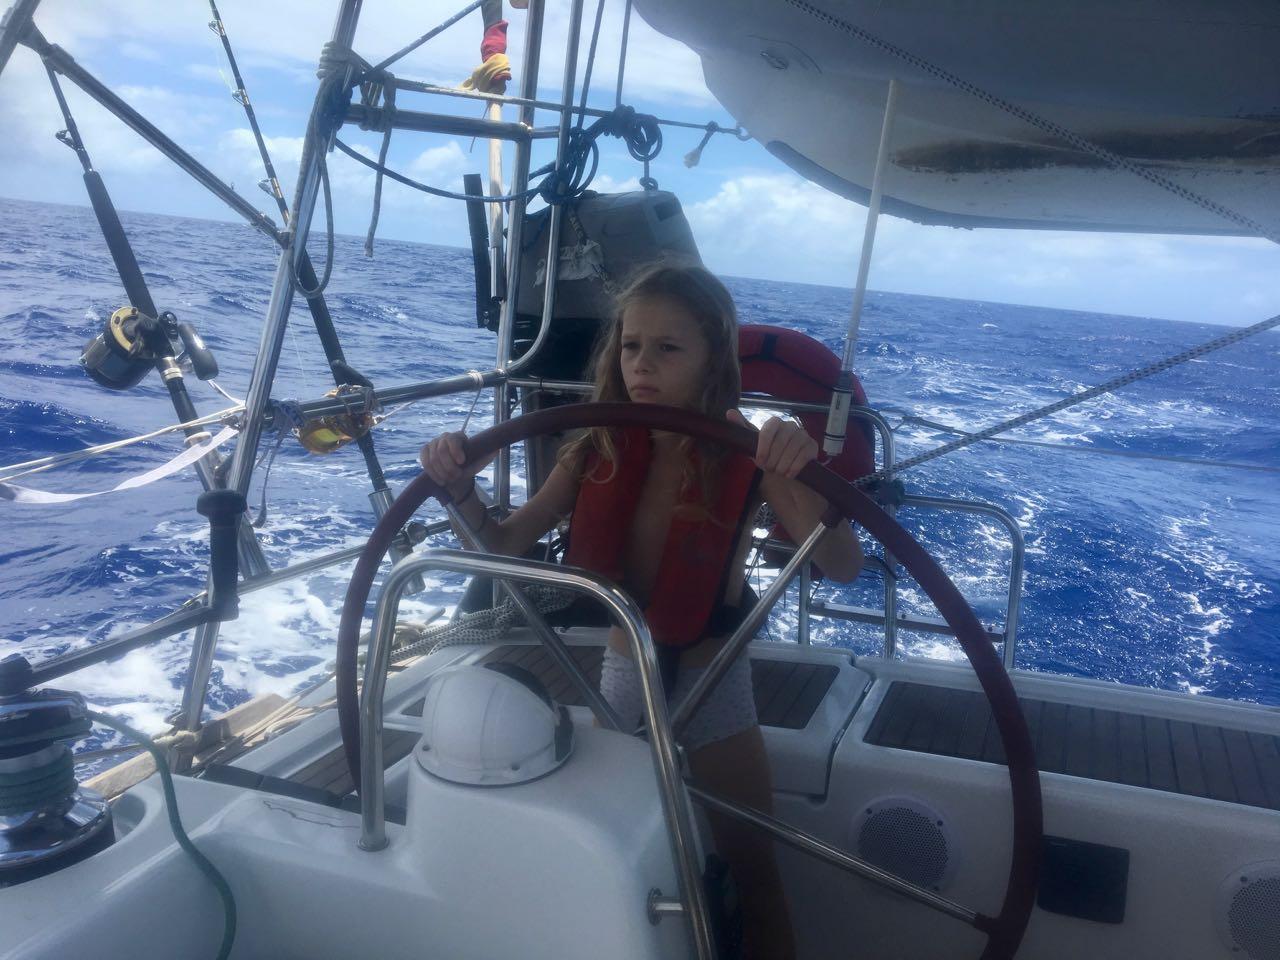 Paula am Steuer der hapa na sasa